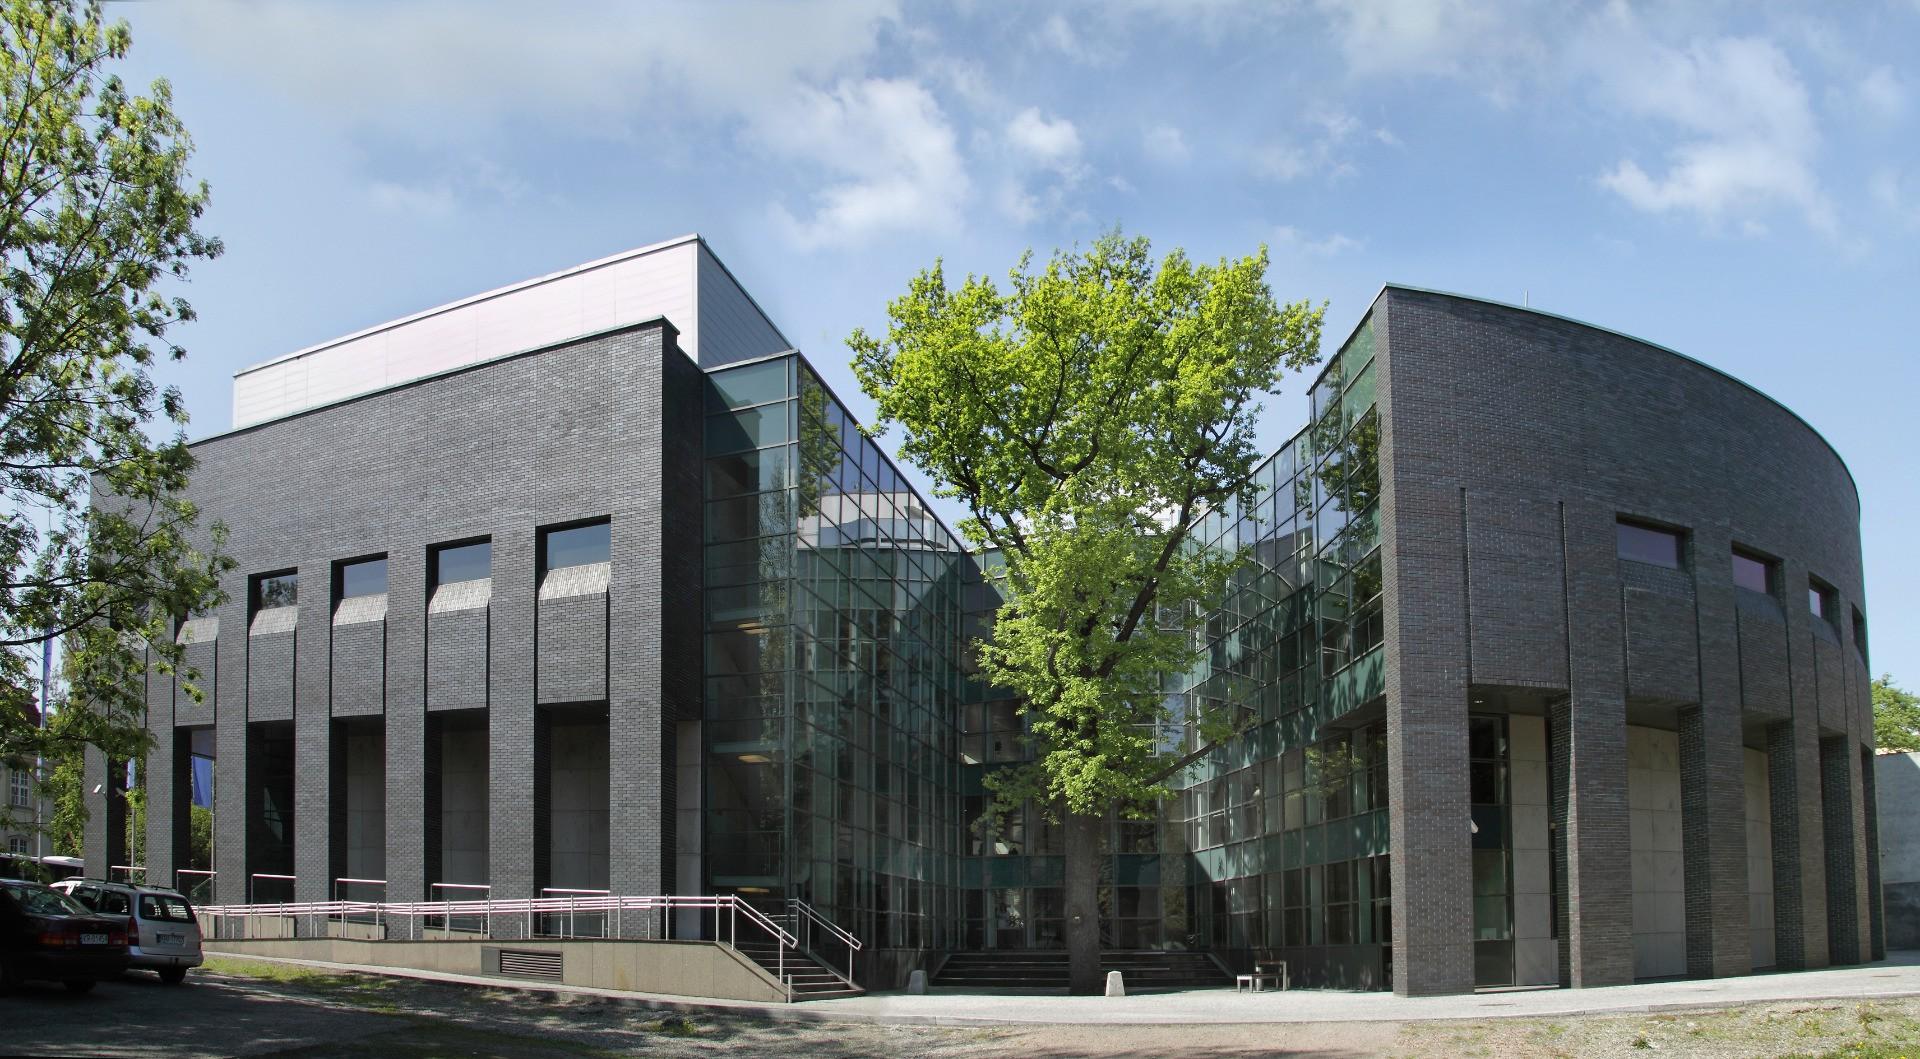 Finishing the construction of Auditorium Maximum at Jagiellonian University